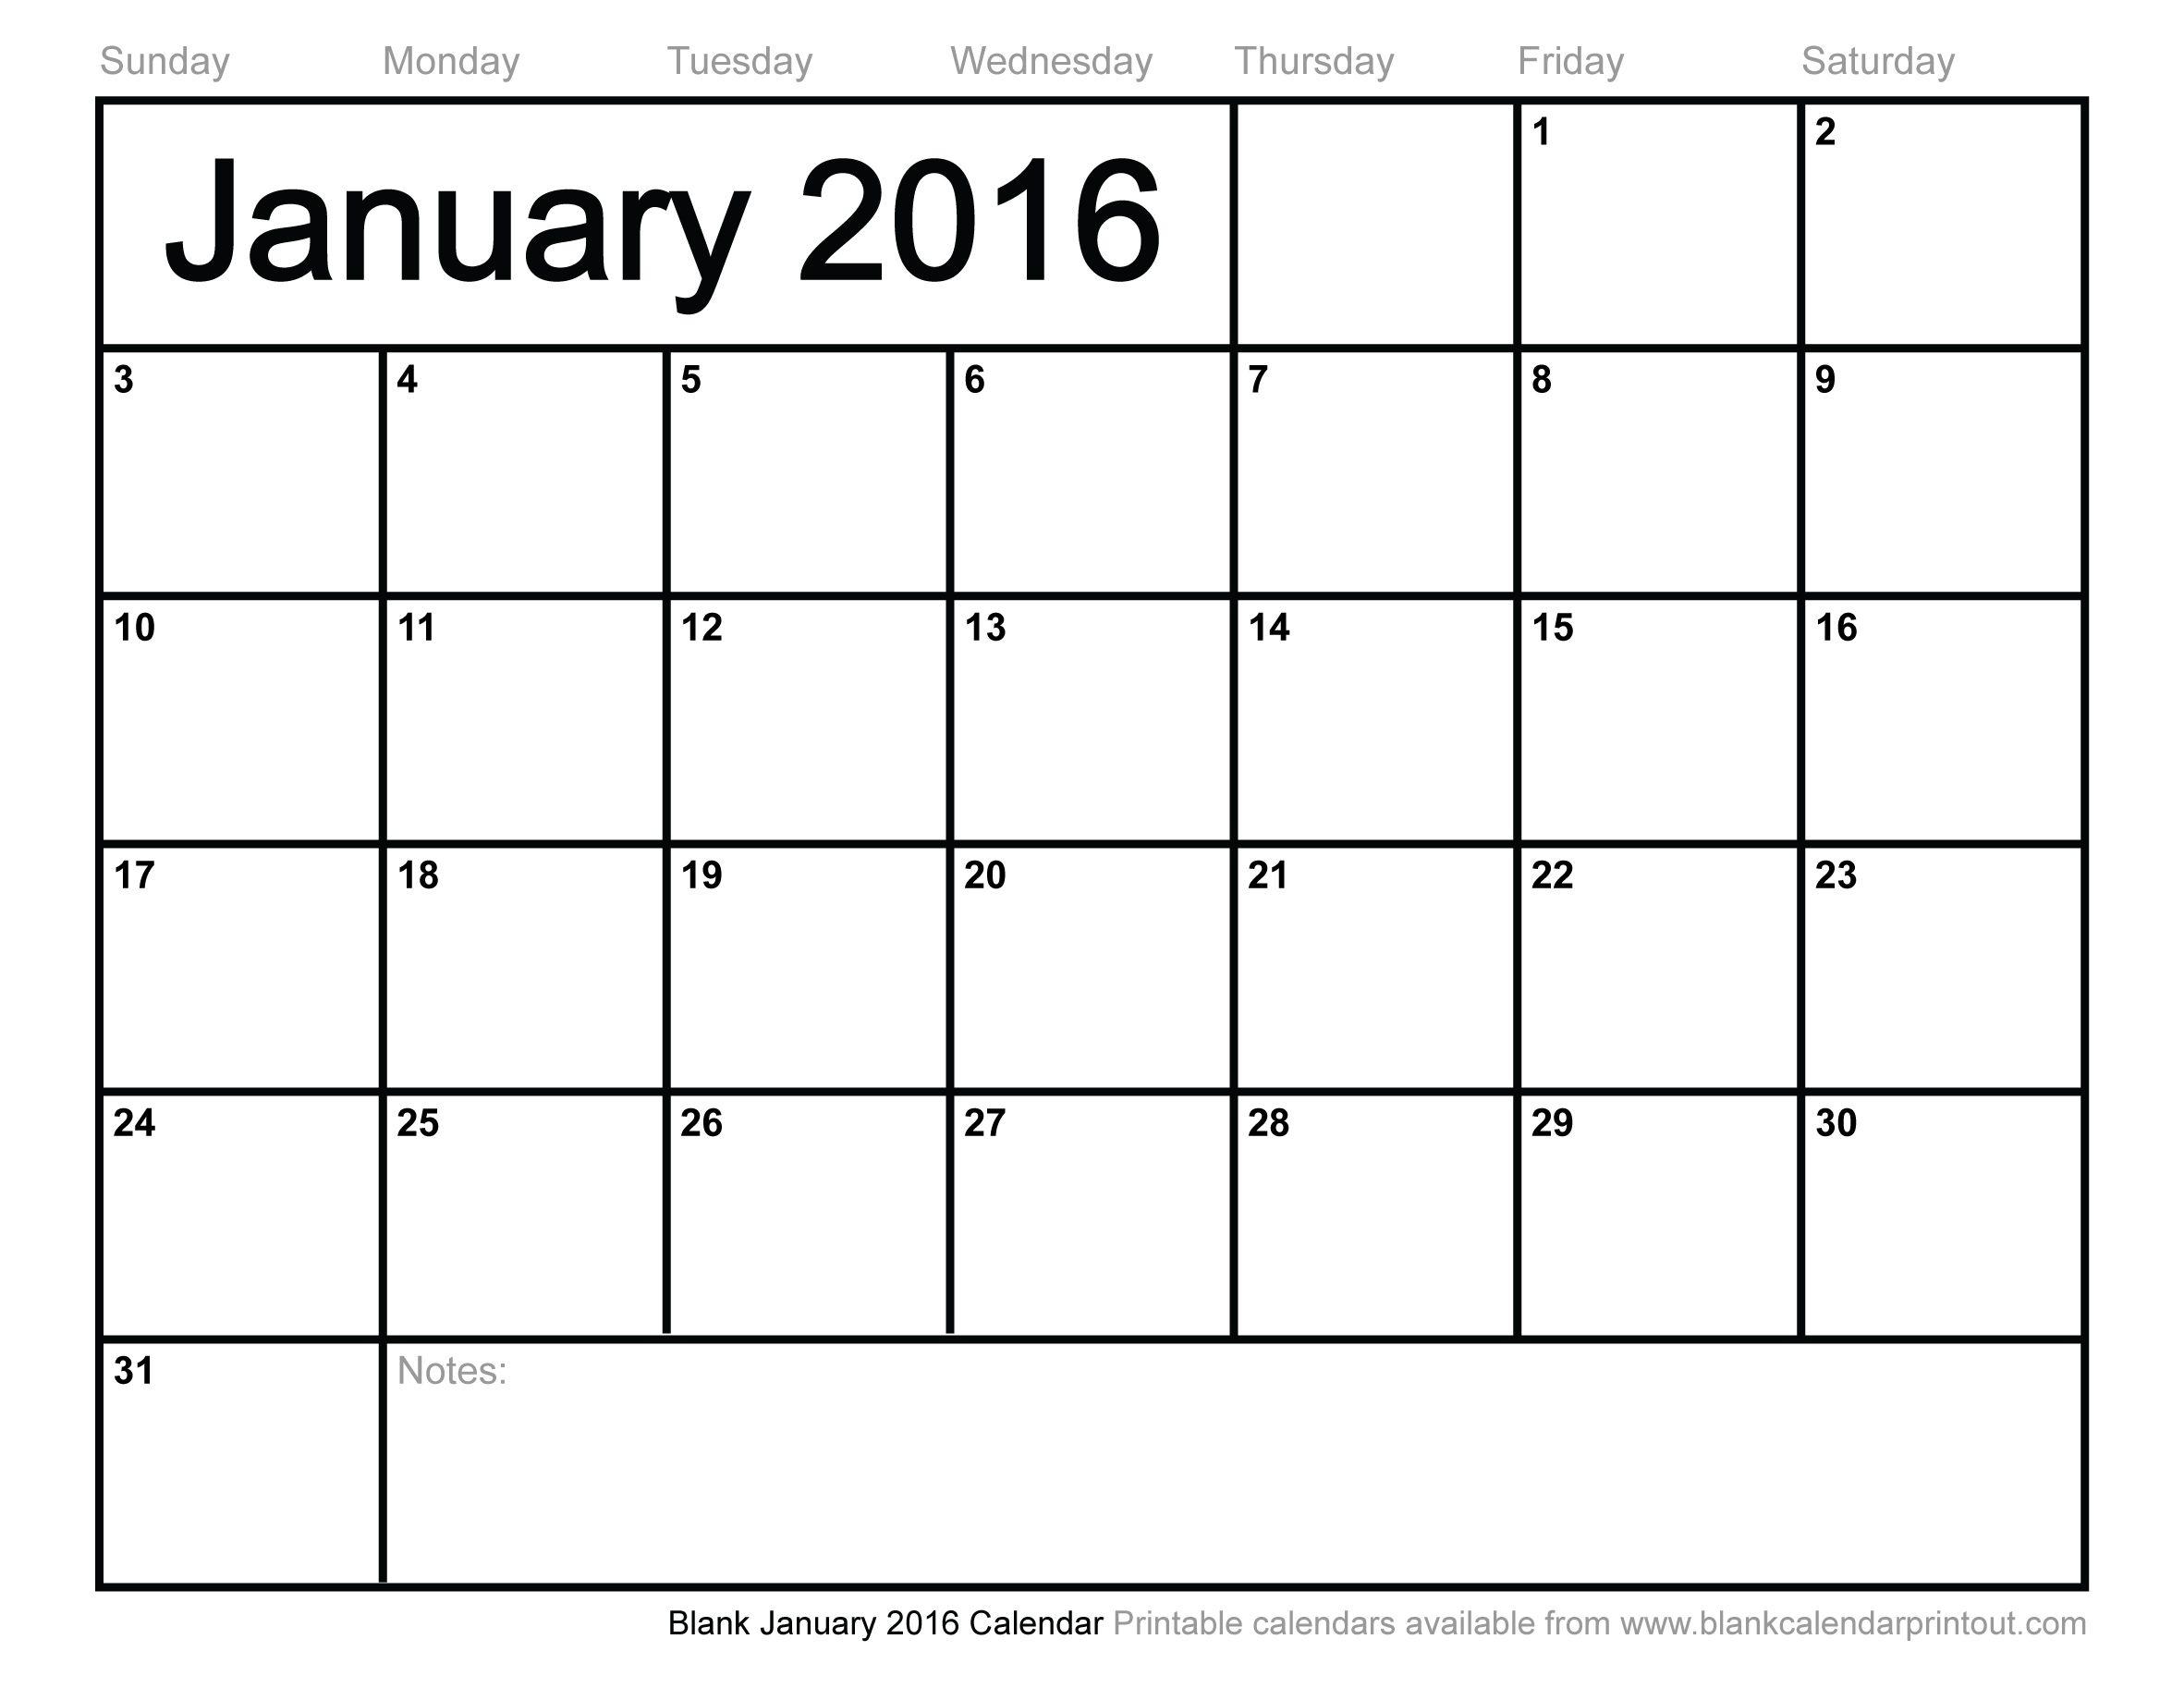 blank-January-2016-calendar.jpg | Calendars | Pinterest | 2016 ...